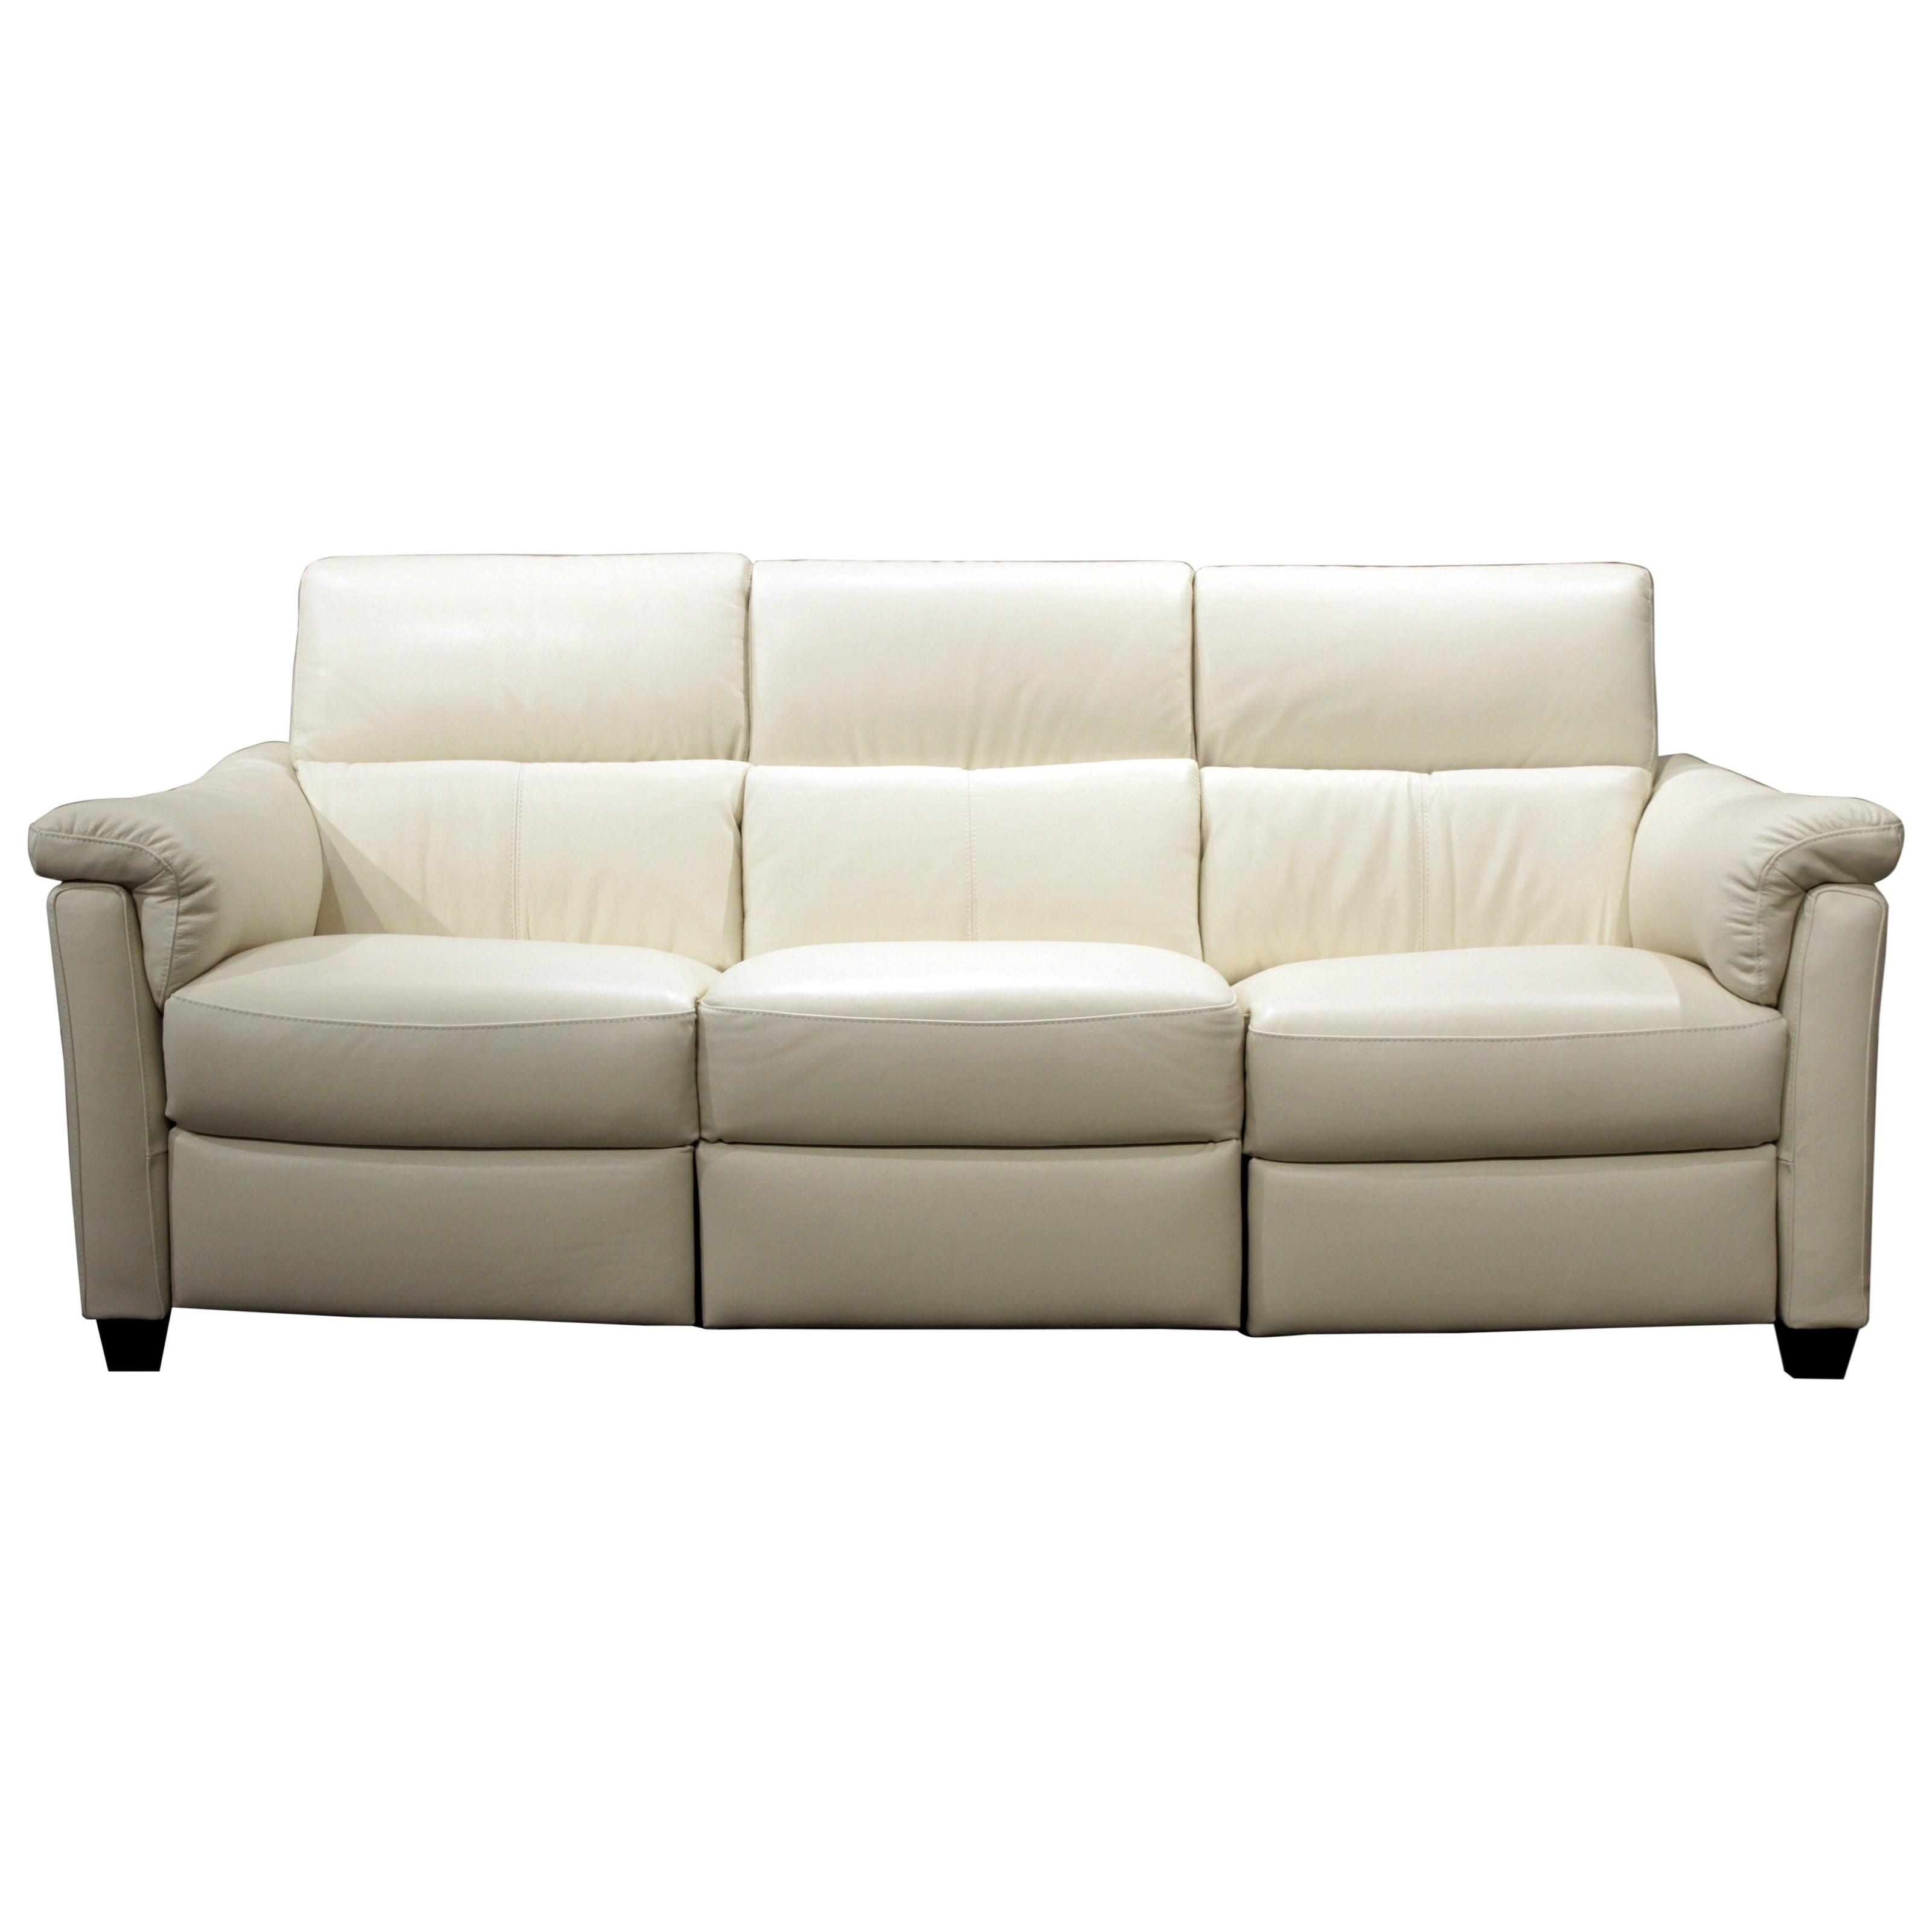 Merveilleux Natuzzi Editions AstuziaPower Reclining Sofa ...